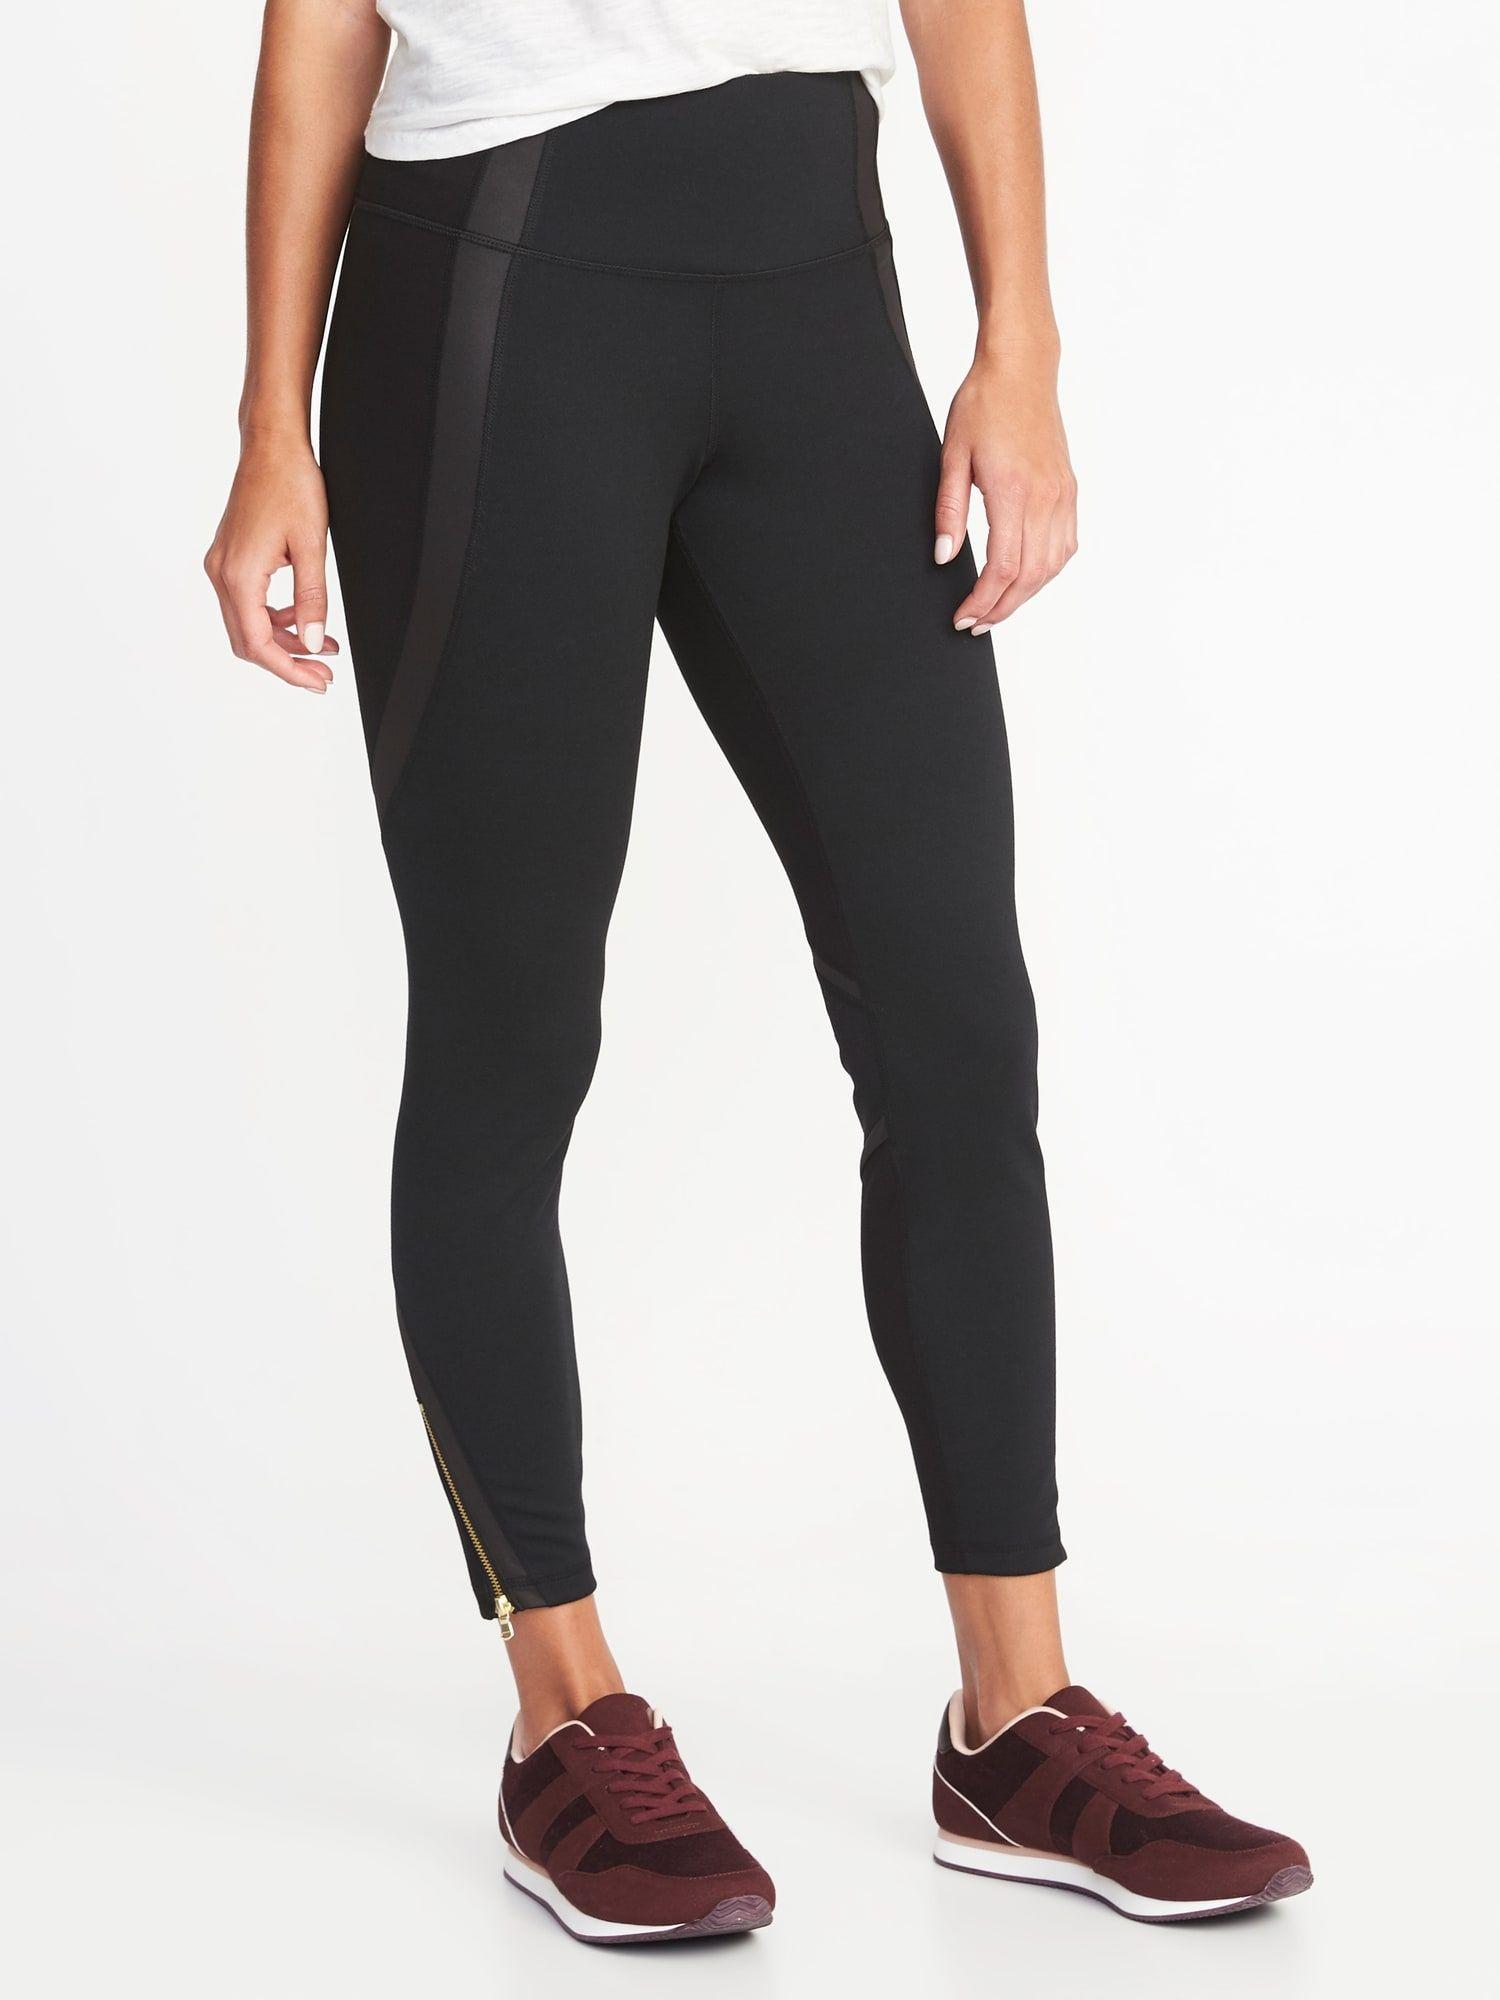 817a2855b3684f High-Rise 7/8-Length Ponte-Knit Ankle-Zip Street Leggings for Women | Old  Navy